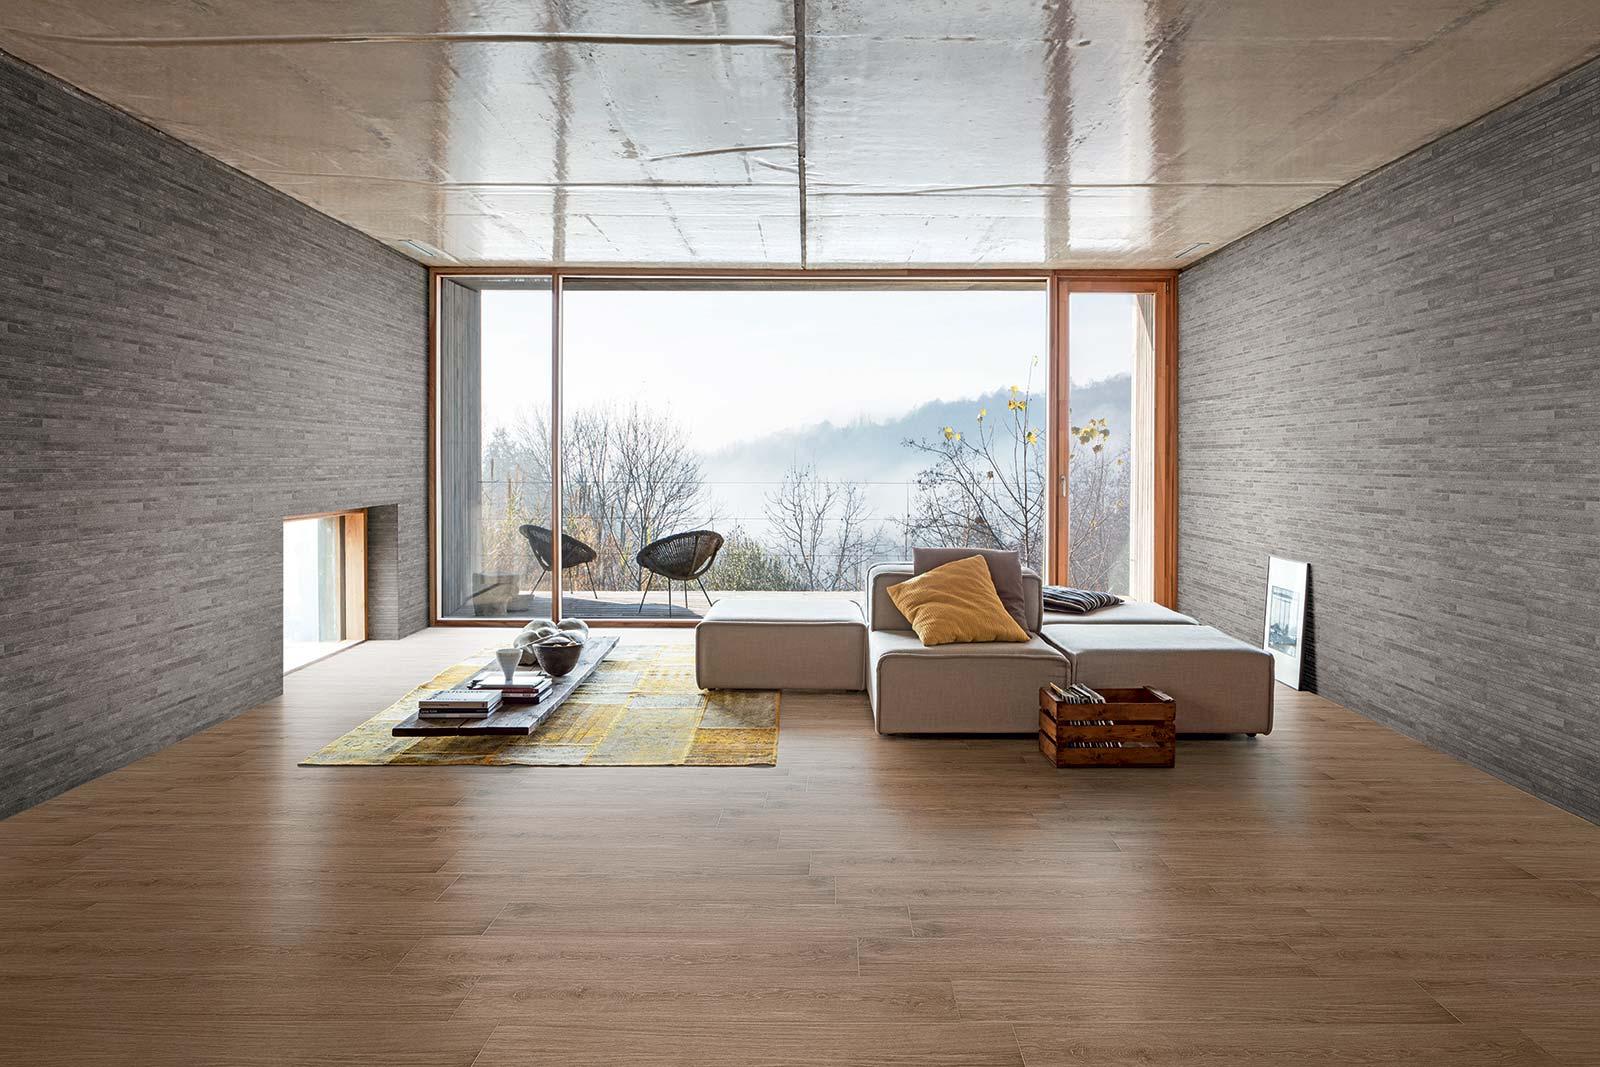 treverkmust azulejos de cermica marazzi_8438 treverkmust suelo imitacin madera